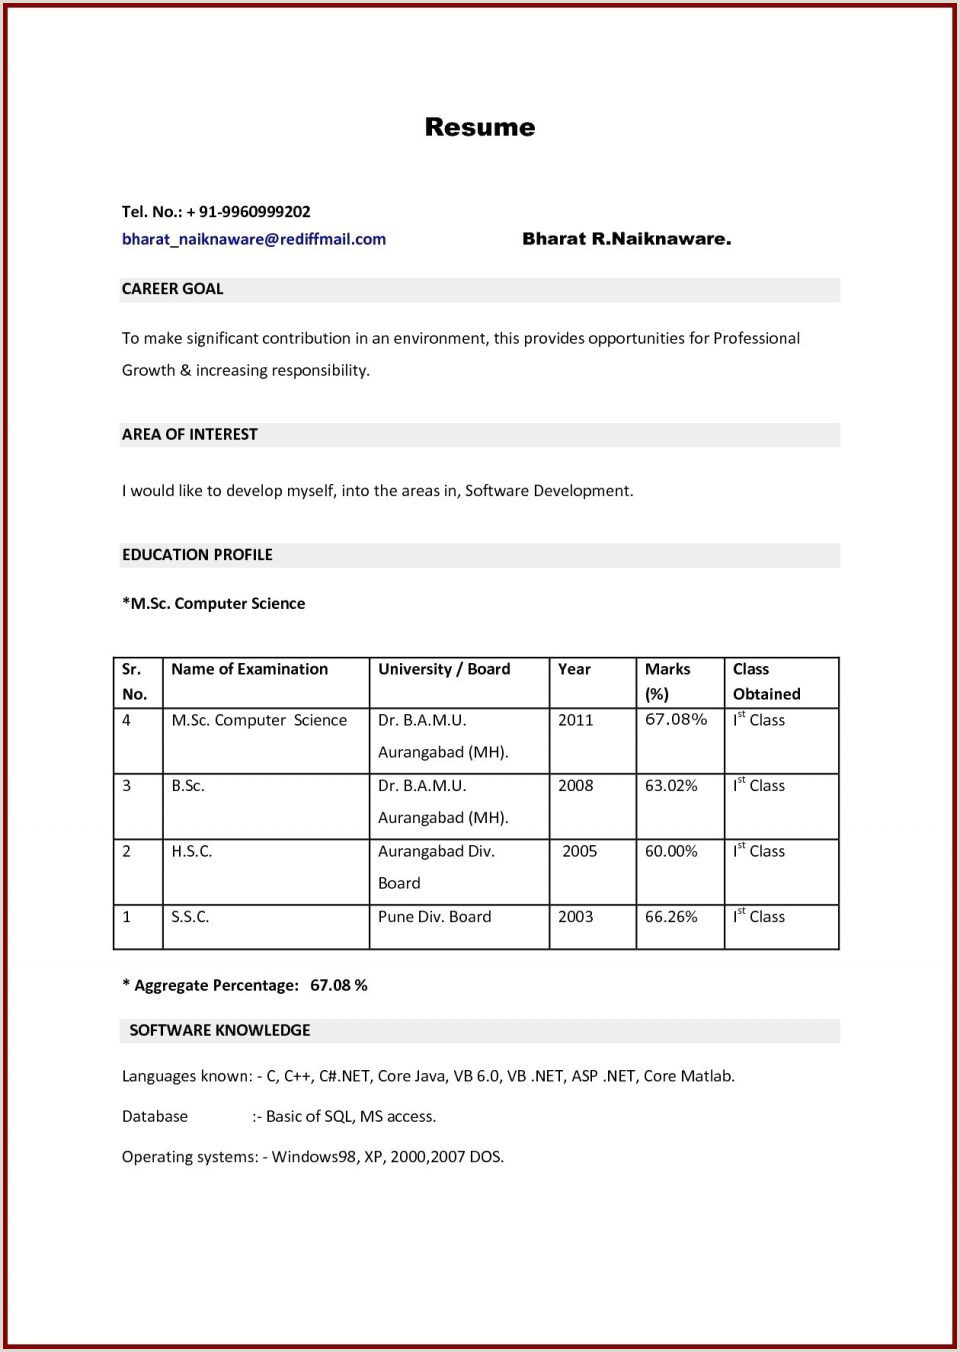 Ca Fresher Cv format New Mba Resumes for Freshers Finance atclgrain Resume Sample